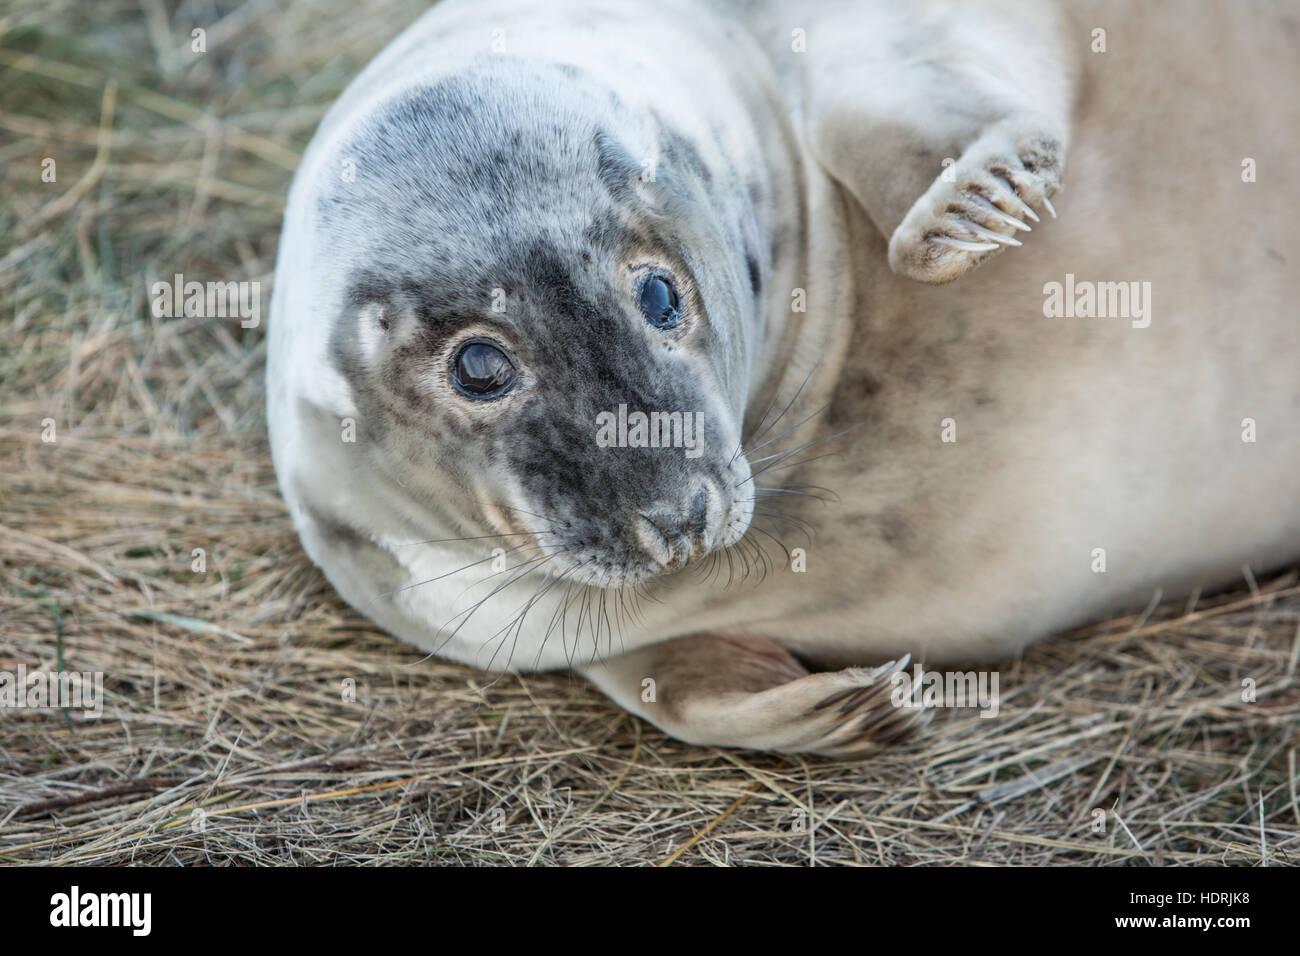 Grey seal basking at Donna Nook resrve in Lincolnshire - Stock Image